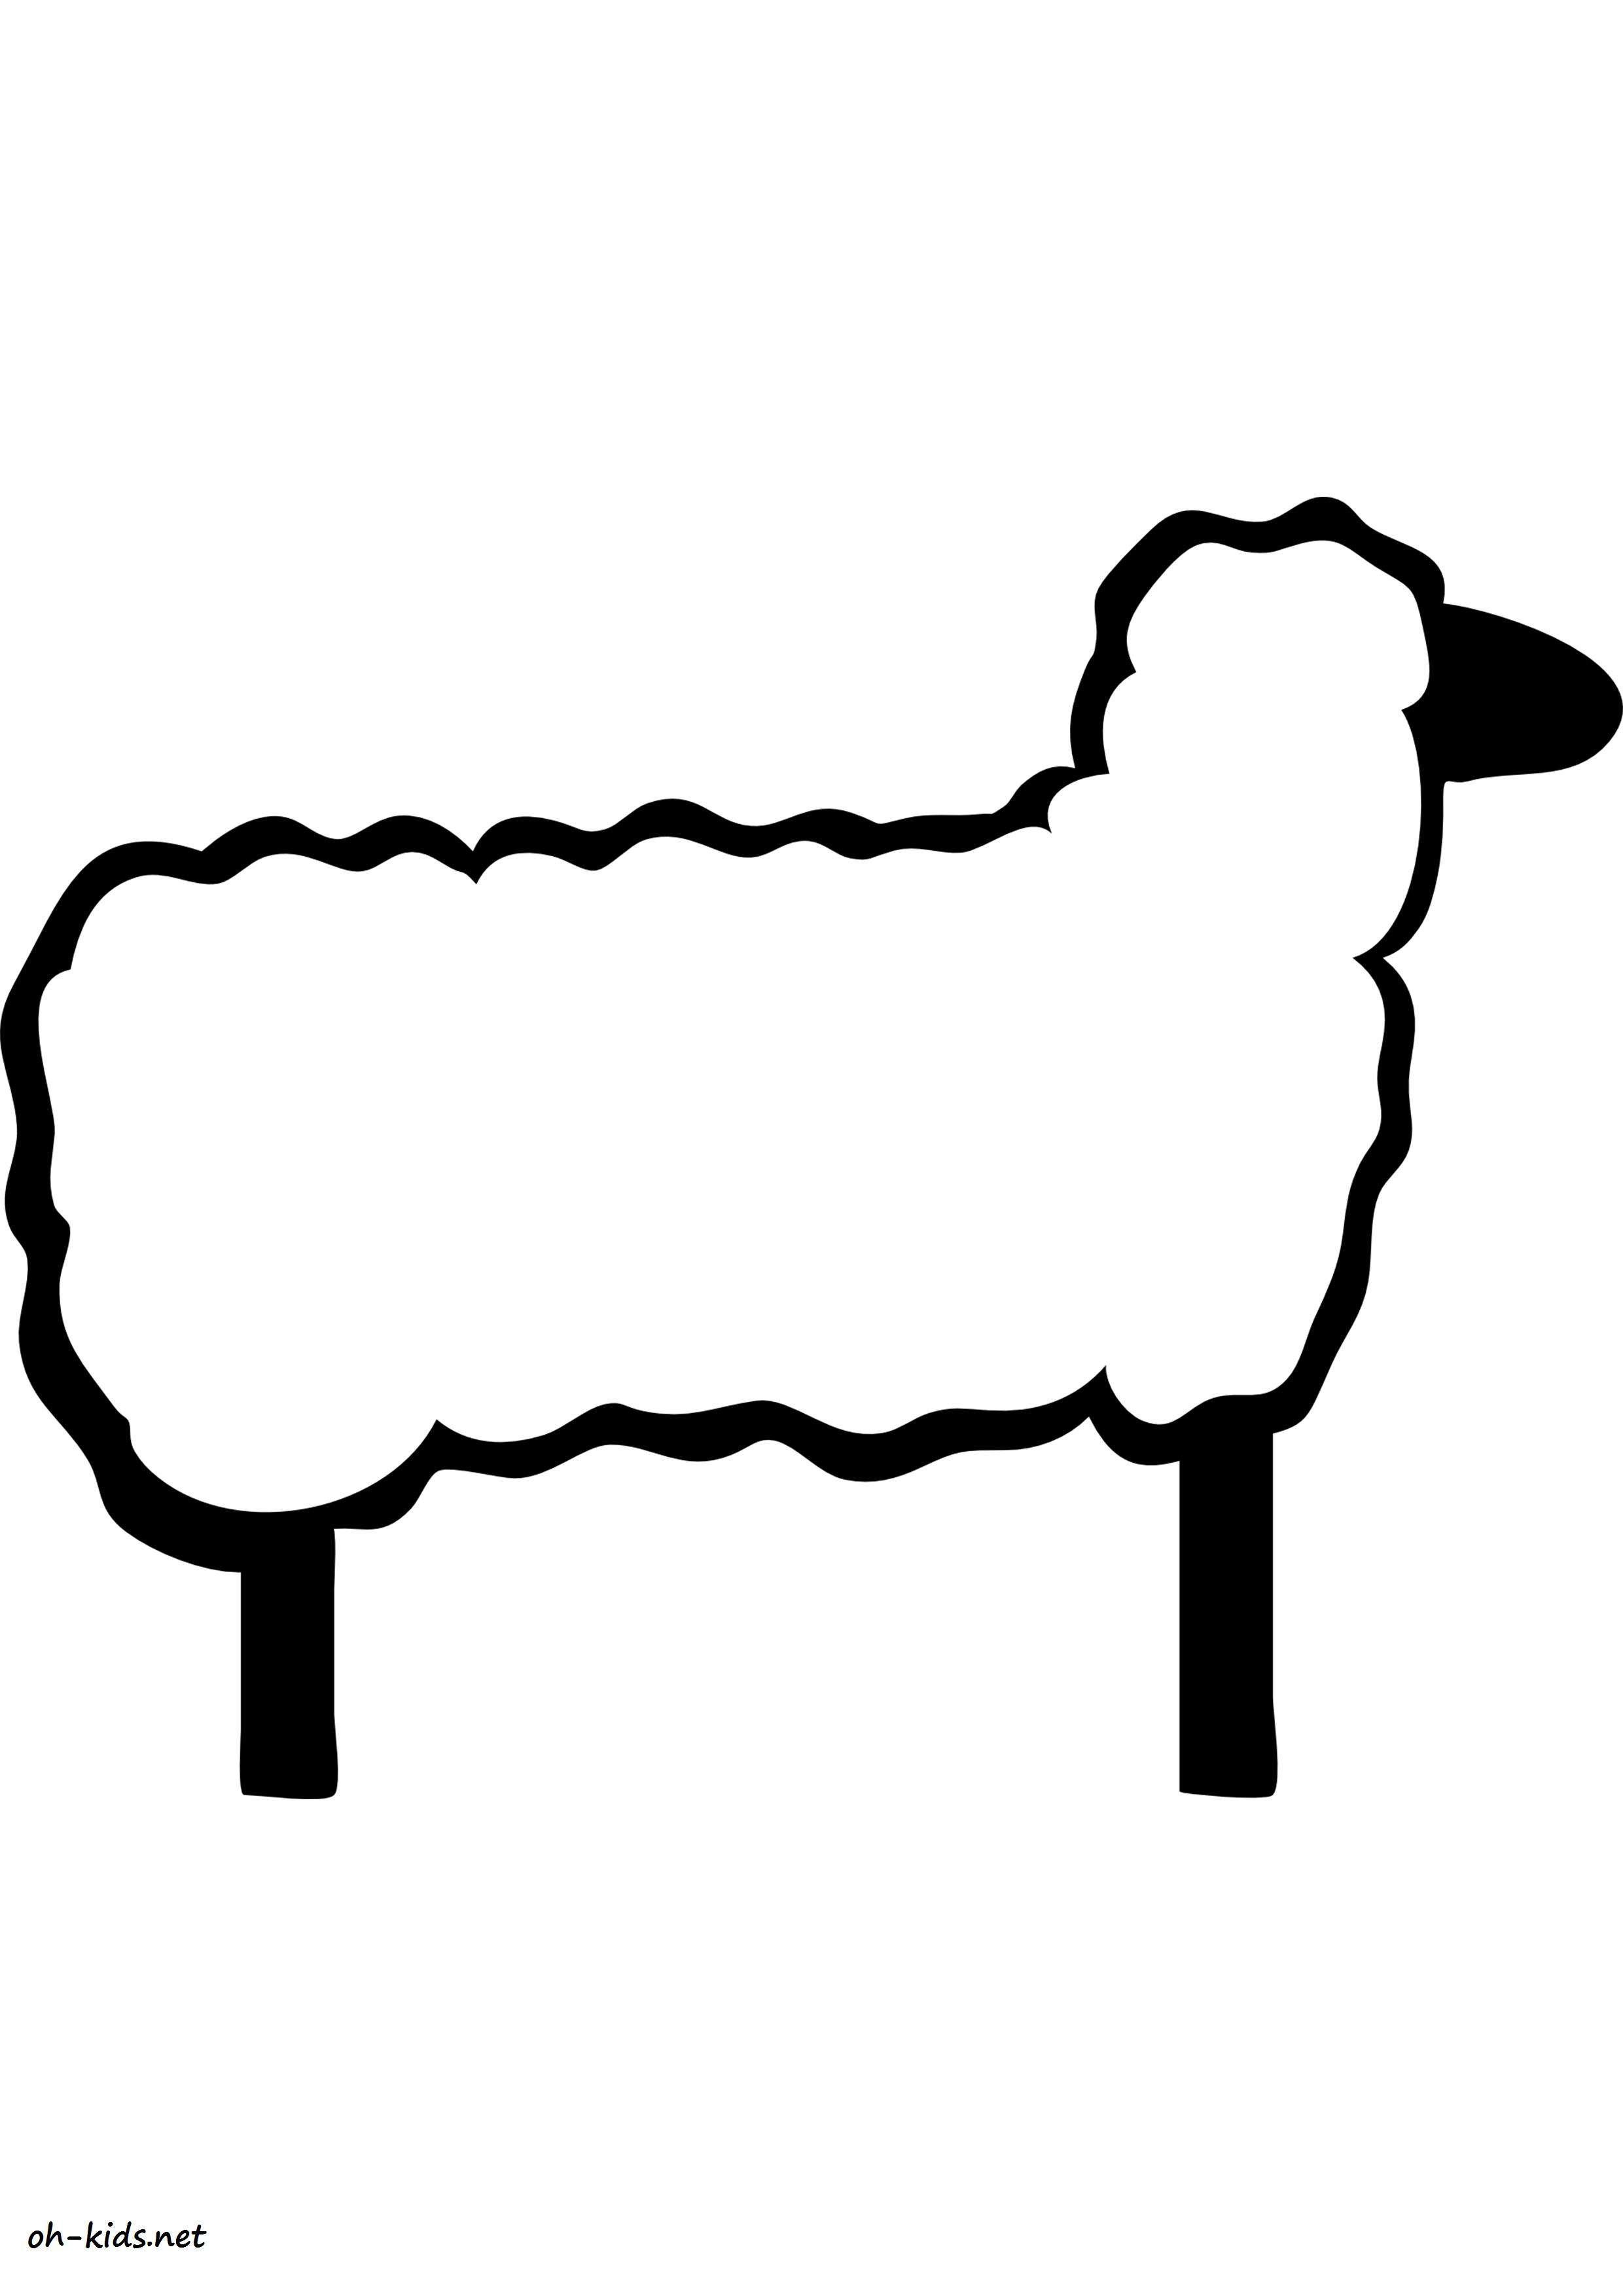 Coloriage agneau oh kids fr - Coloriage agneau ...